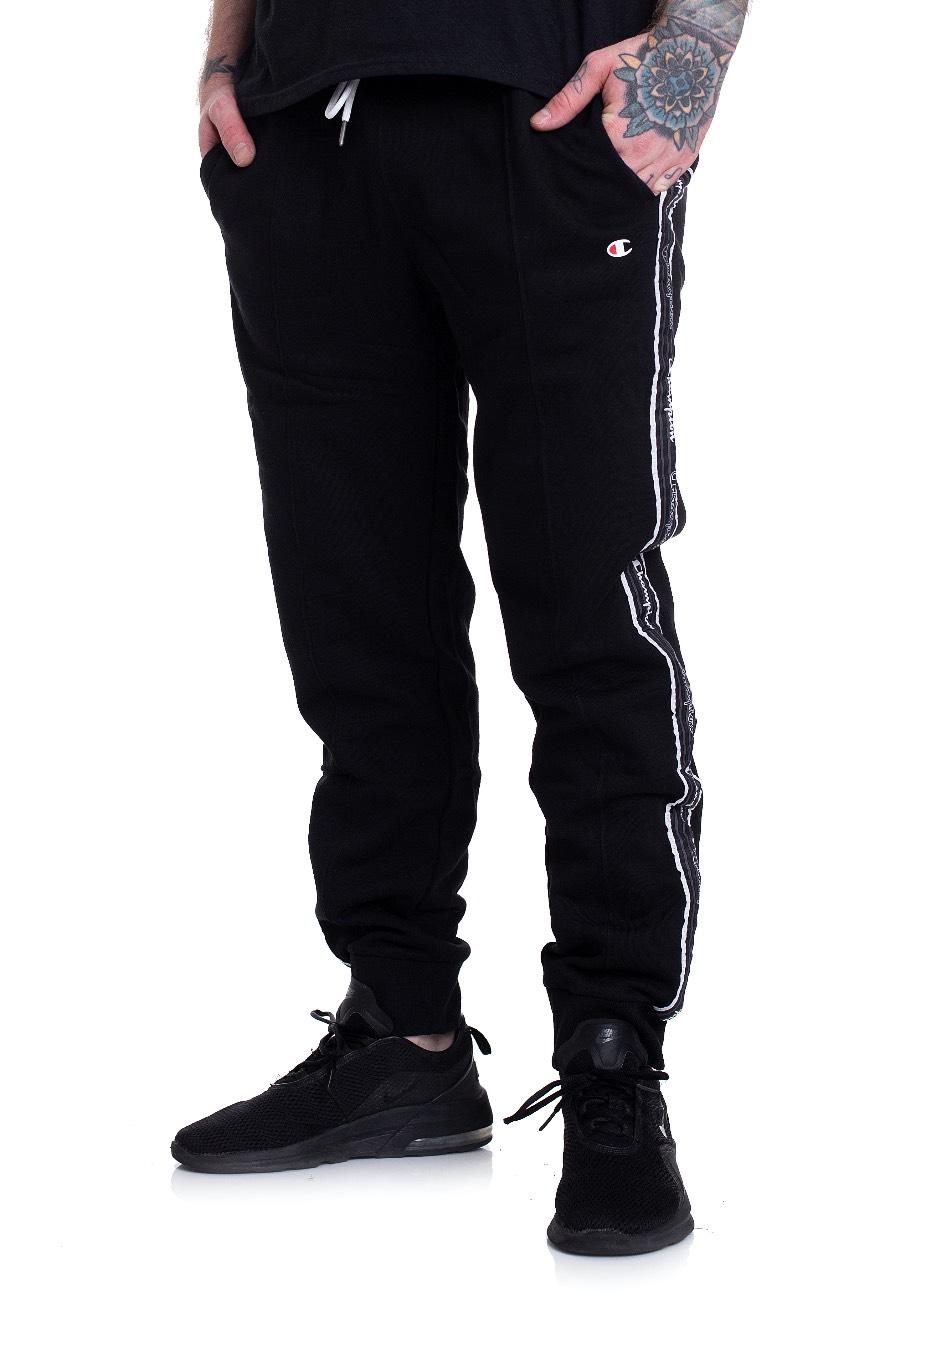 Champion Herren Pants Rib Cuff black